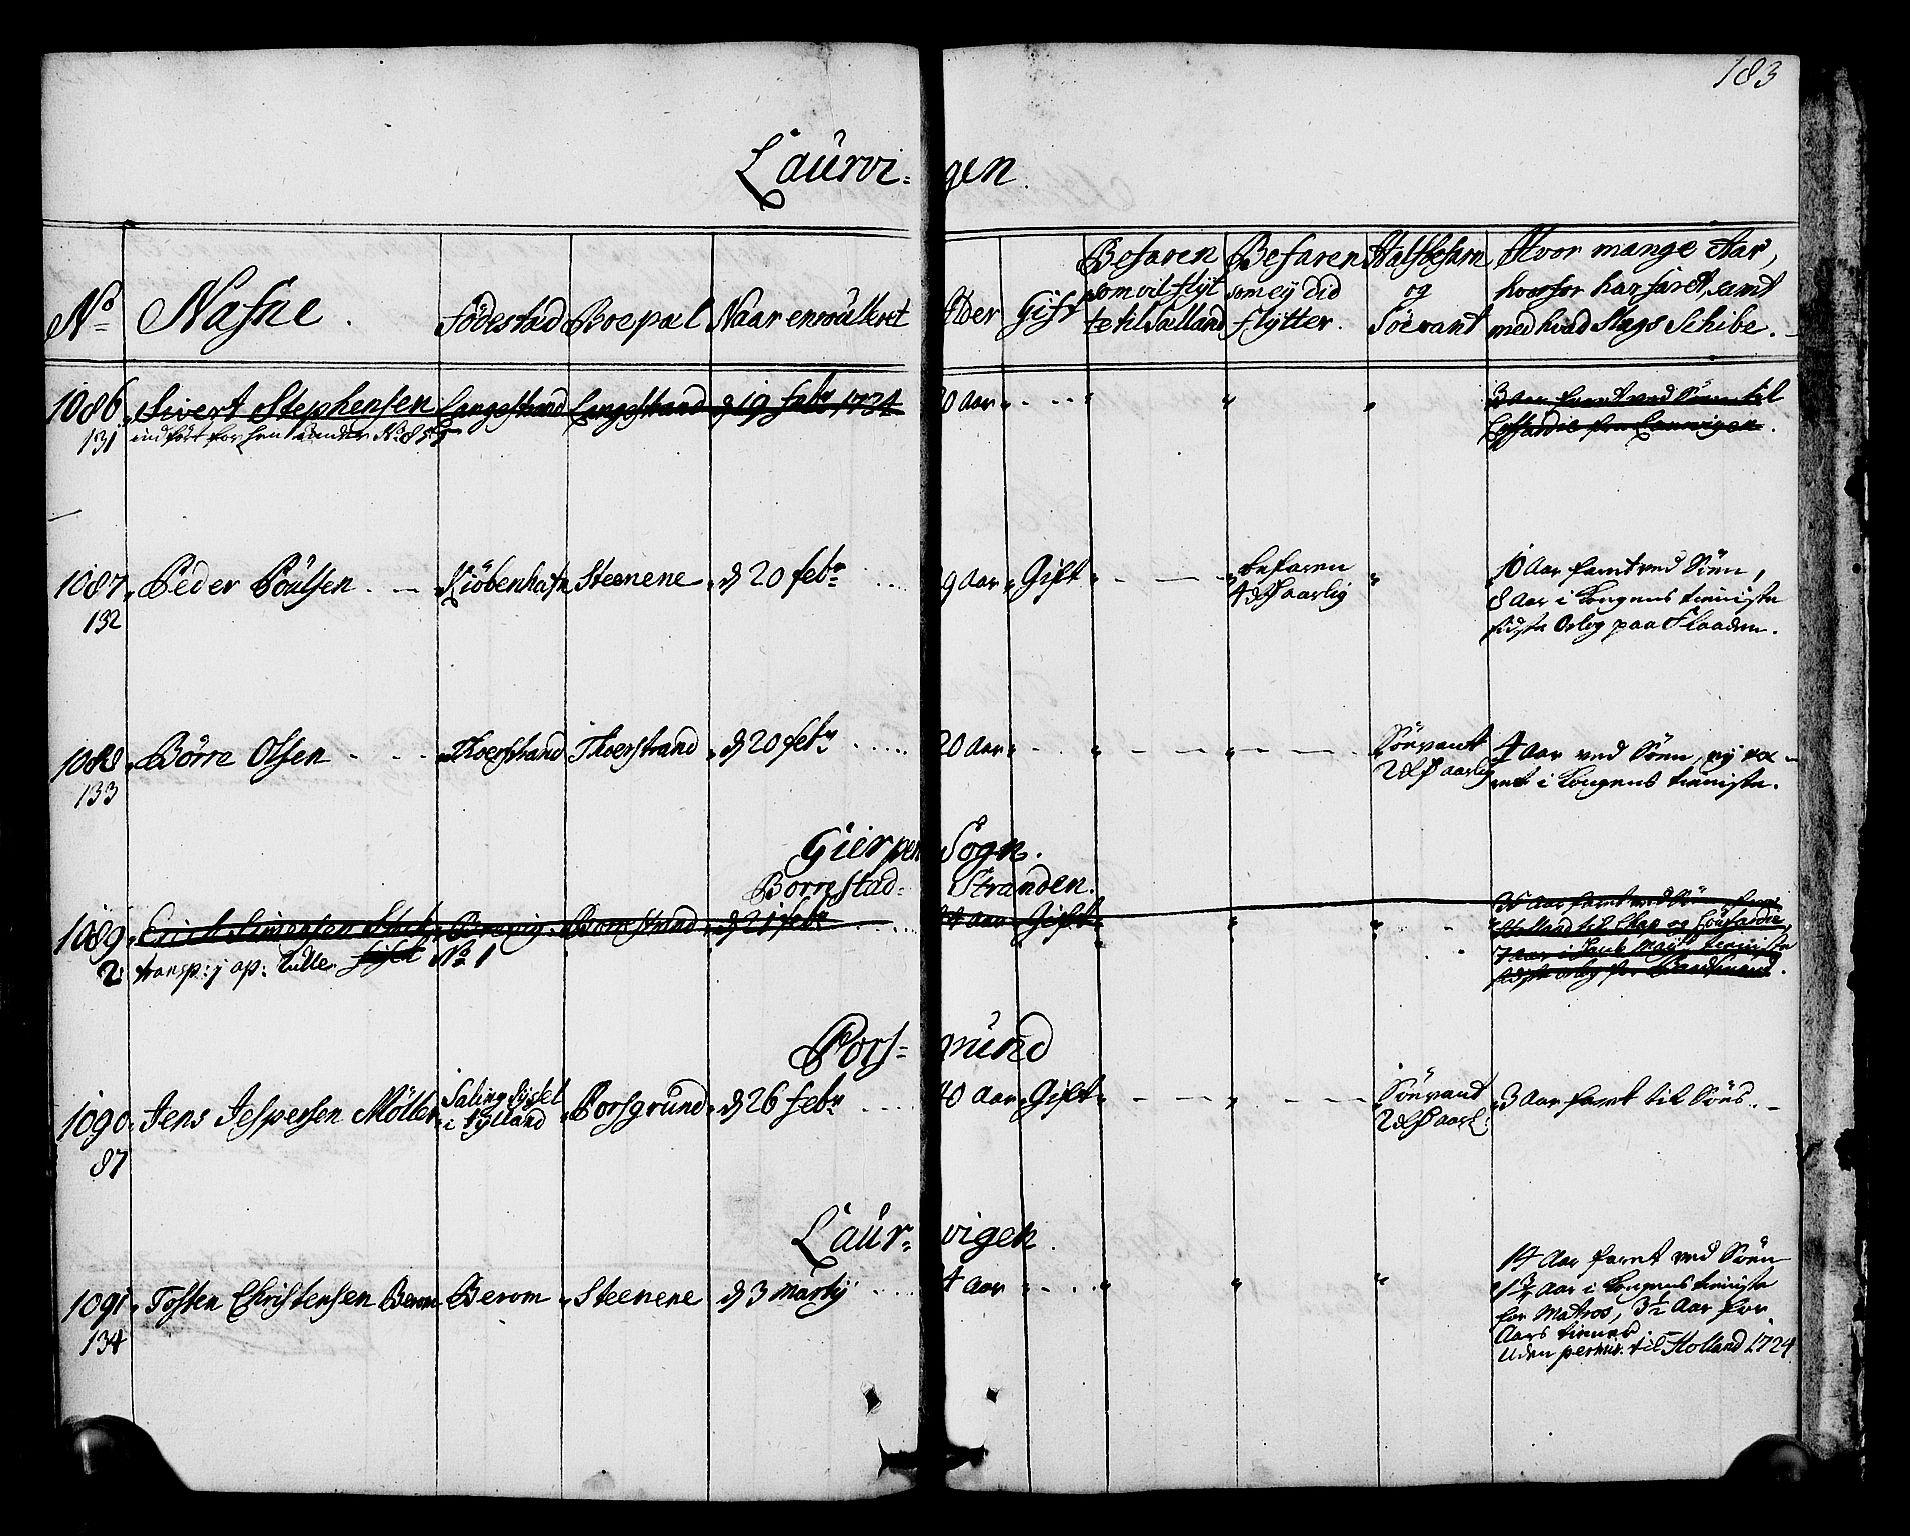 SAKO, Drammen innrulleringsdistrikt, F/Fa/L0002: Hovedrulle, 1723-1726, p. 184